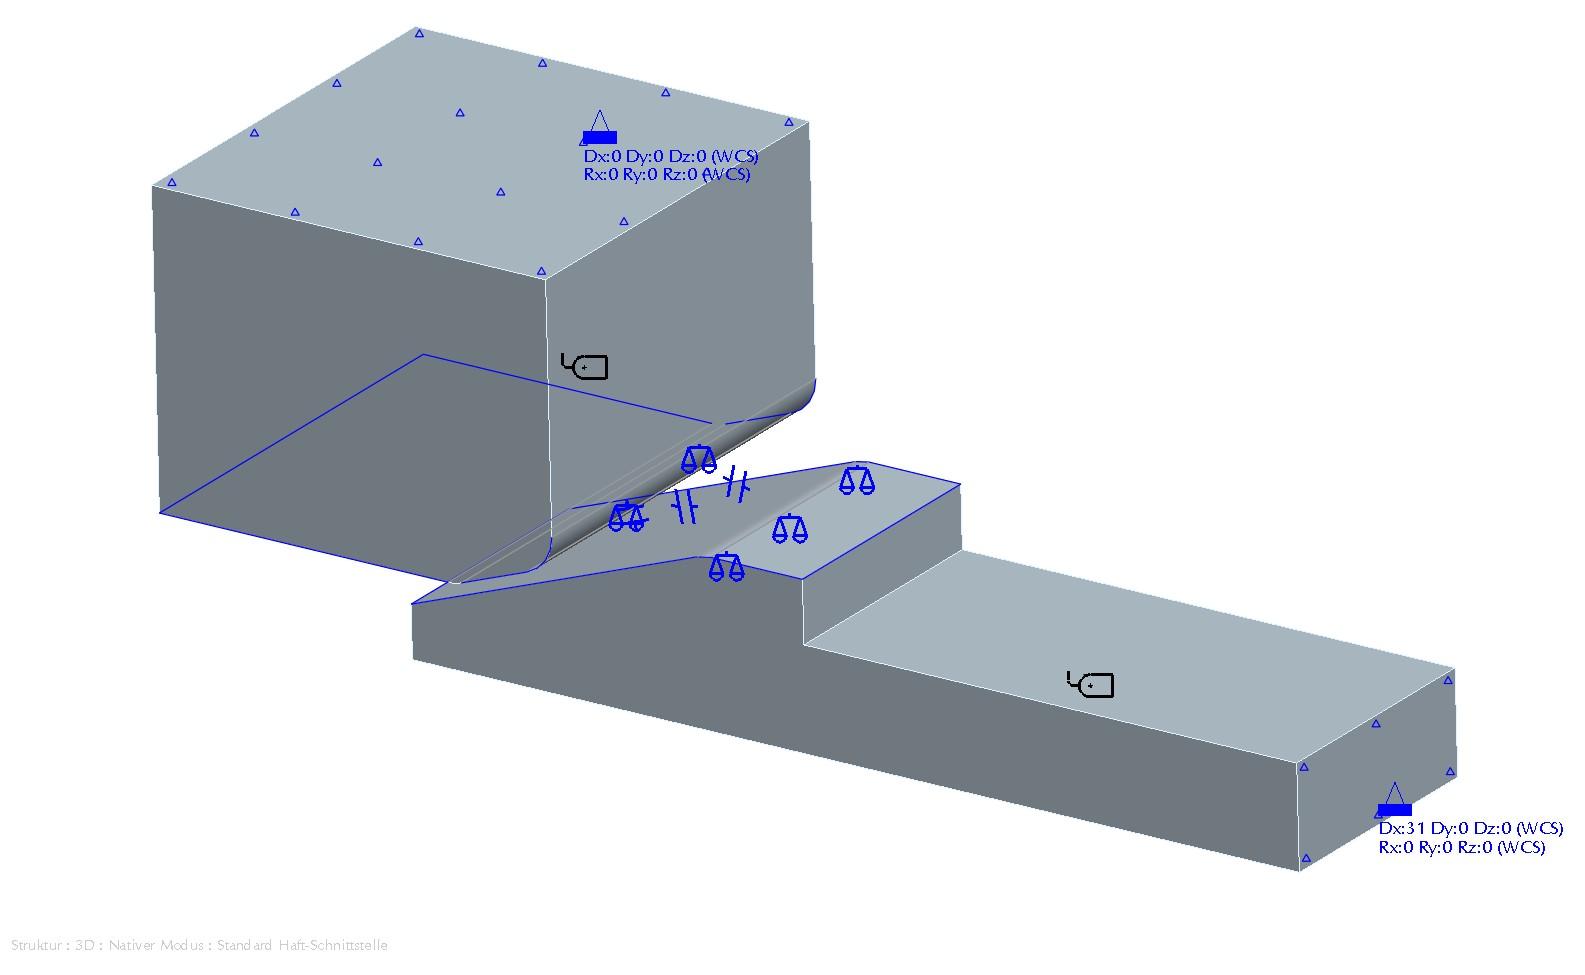 schnappverbindung mit kontakt ptc engineering solutions. Black Bedroom Furniture Sets. Home Design Ideas